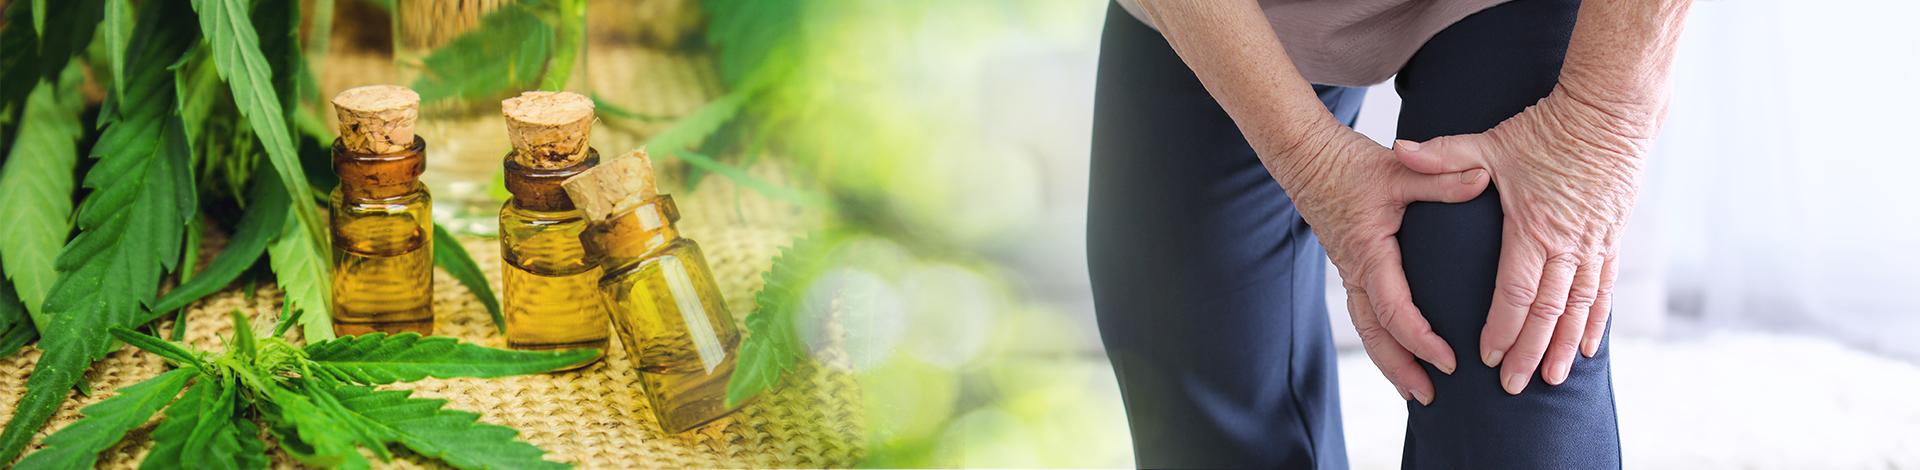 CBD for Arthritis: Medical Benefits, Studies, and Dosage